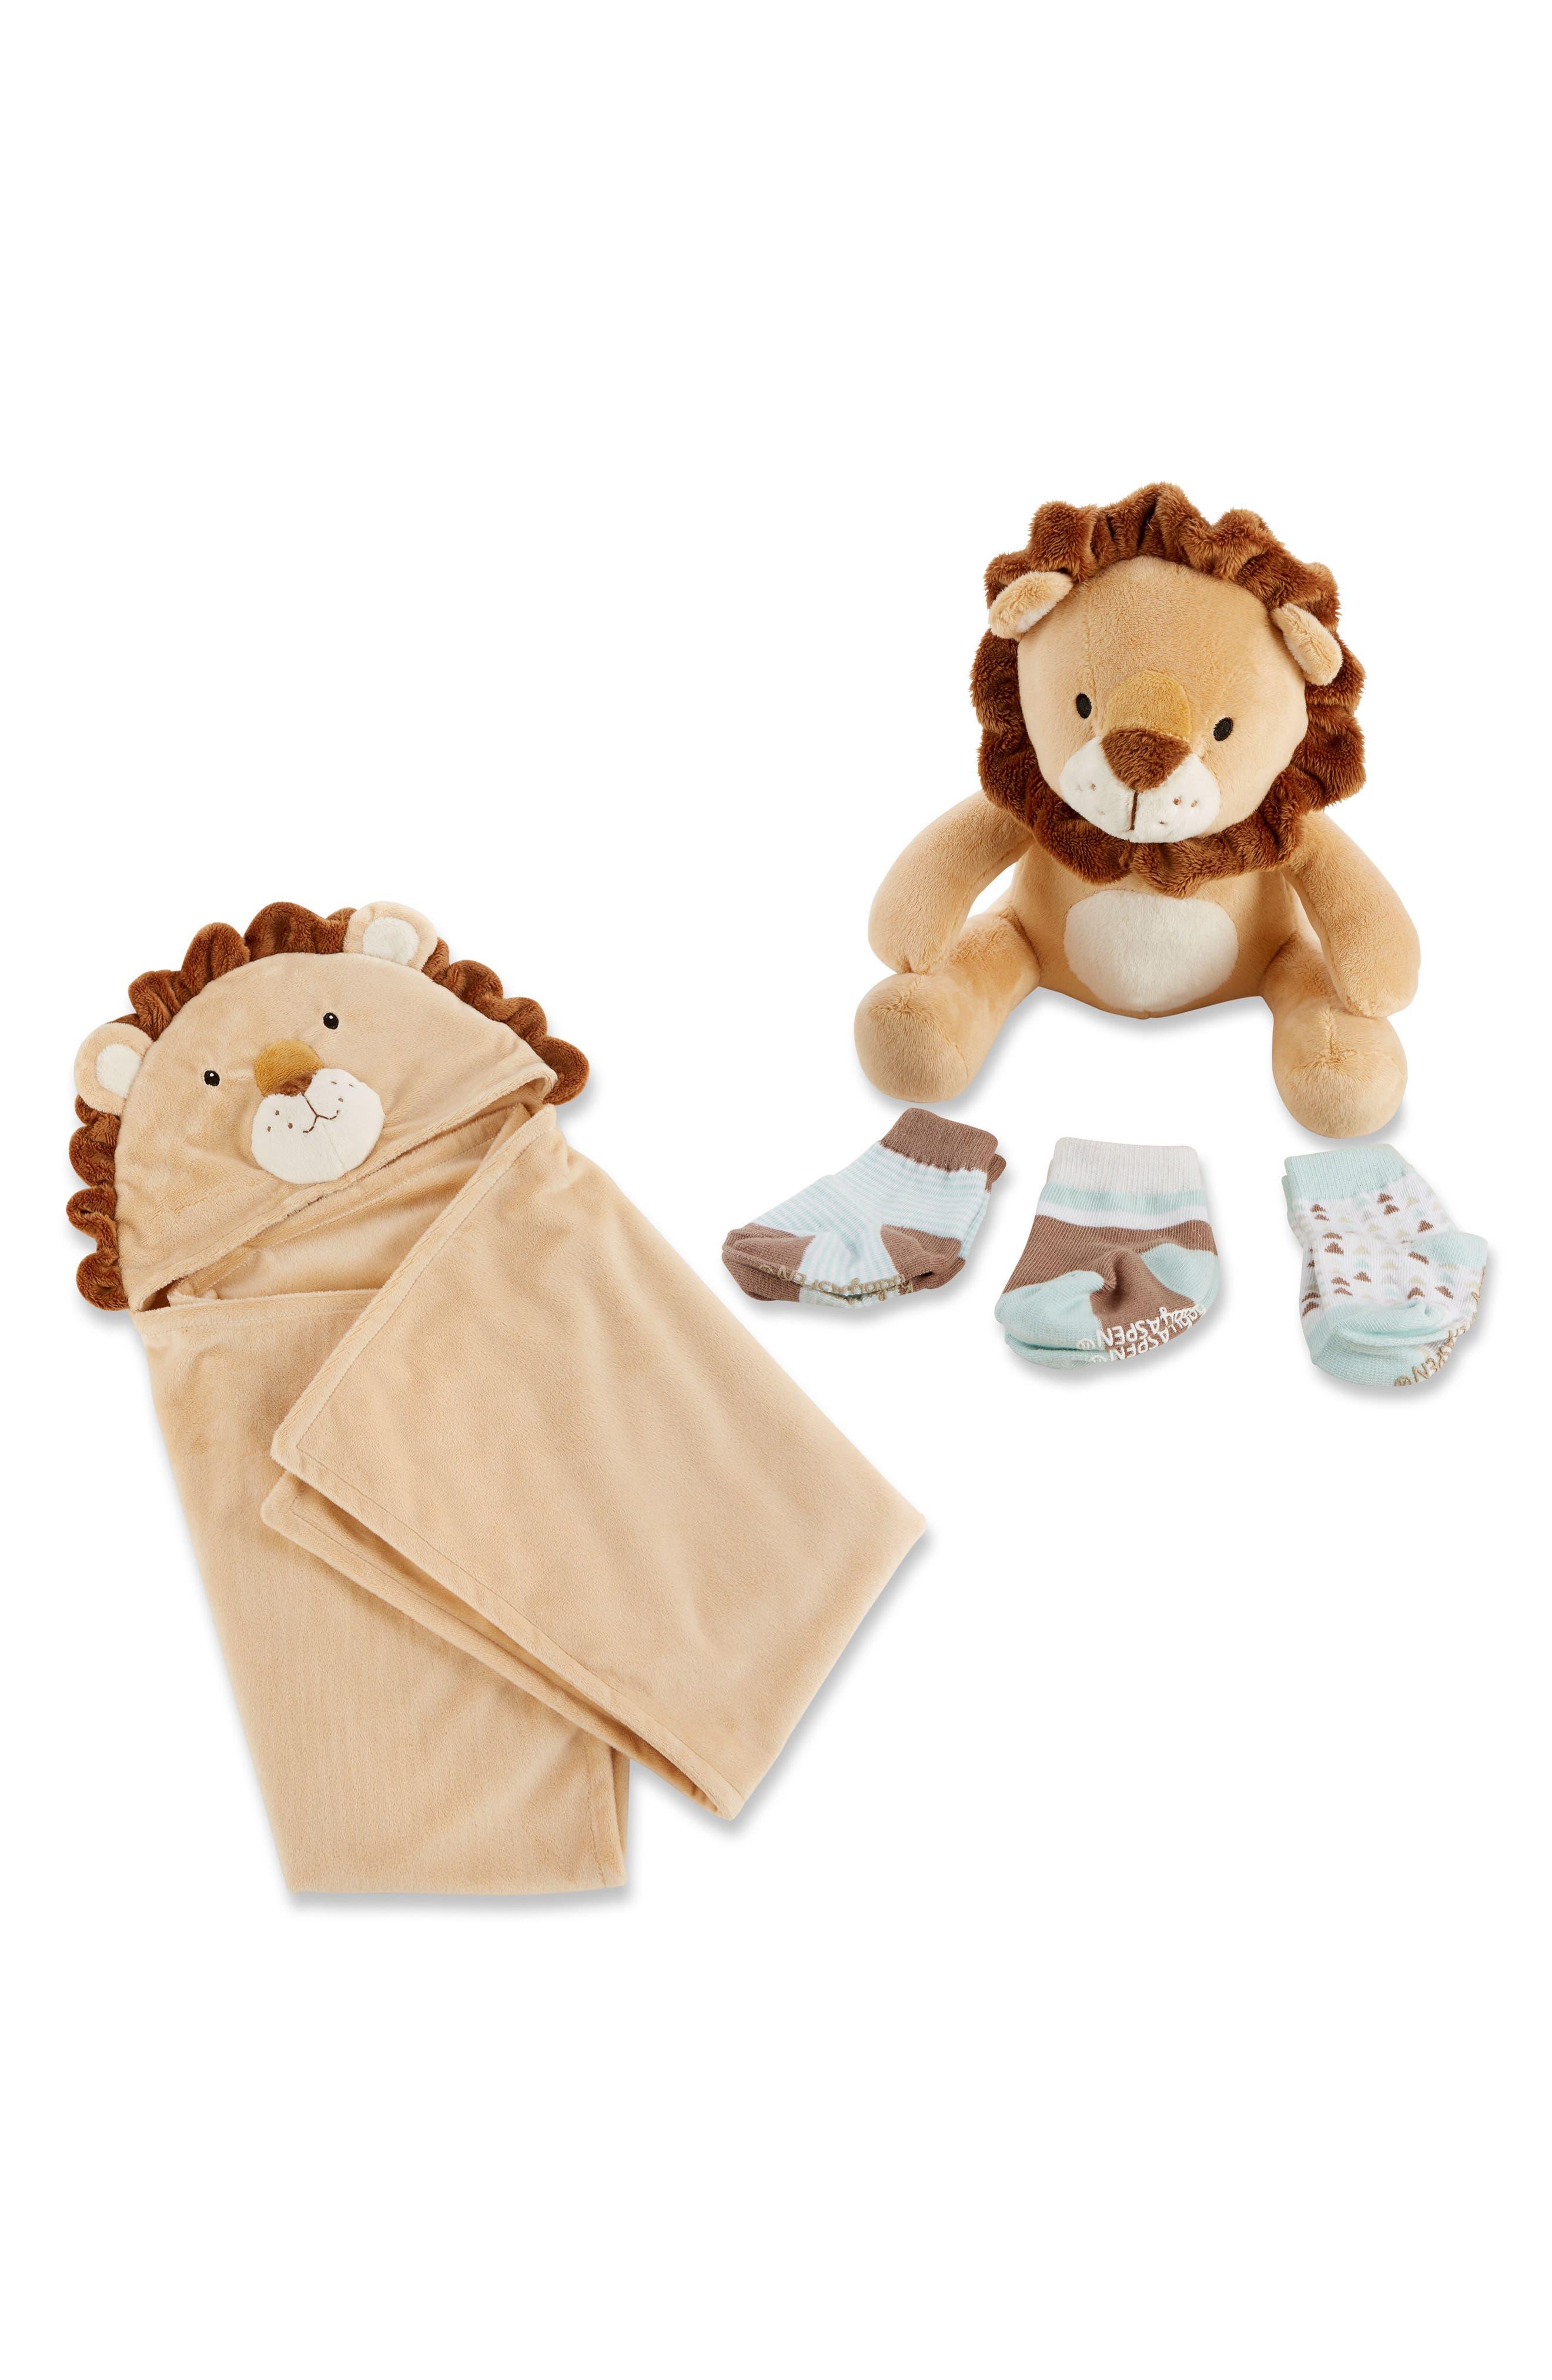 Lion Safari Hooded Blanket, 3-Pack Socks & Stuffed Animal Set,                             Main thumbnail 1, color,                             Brown